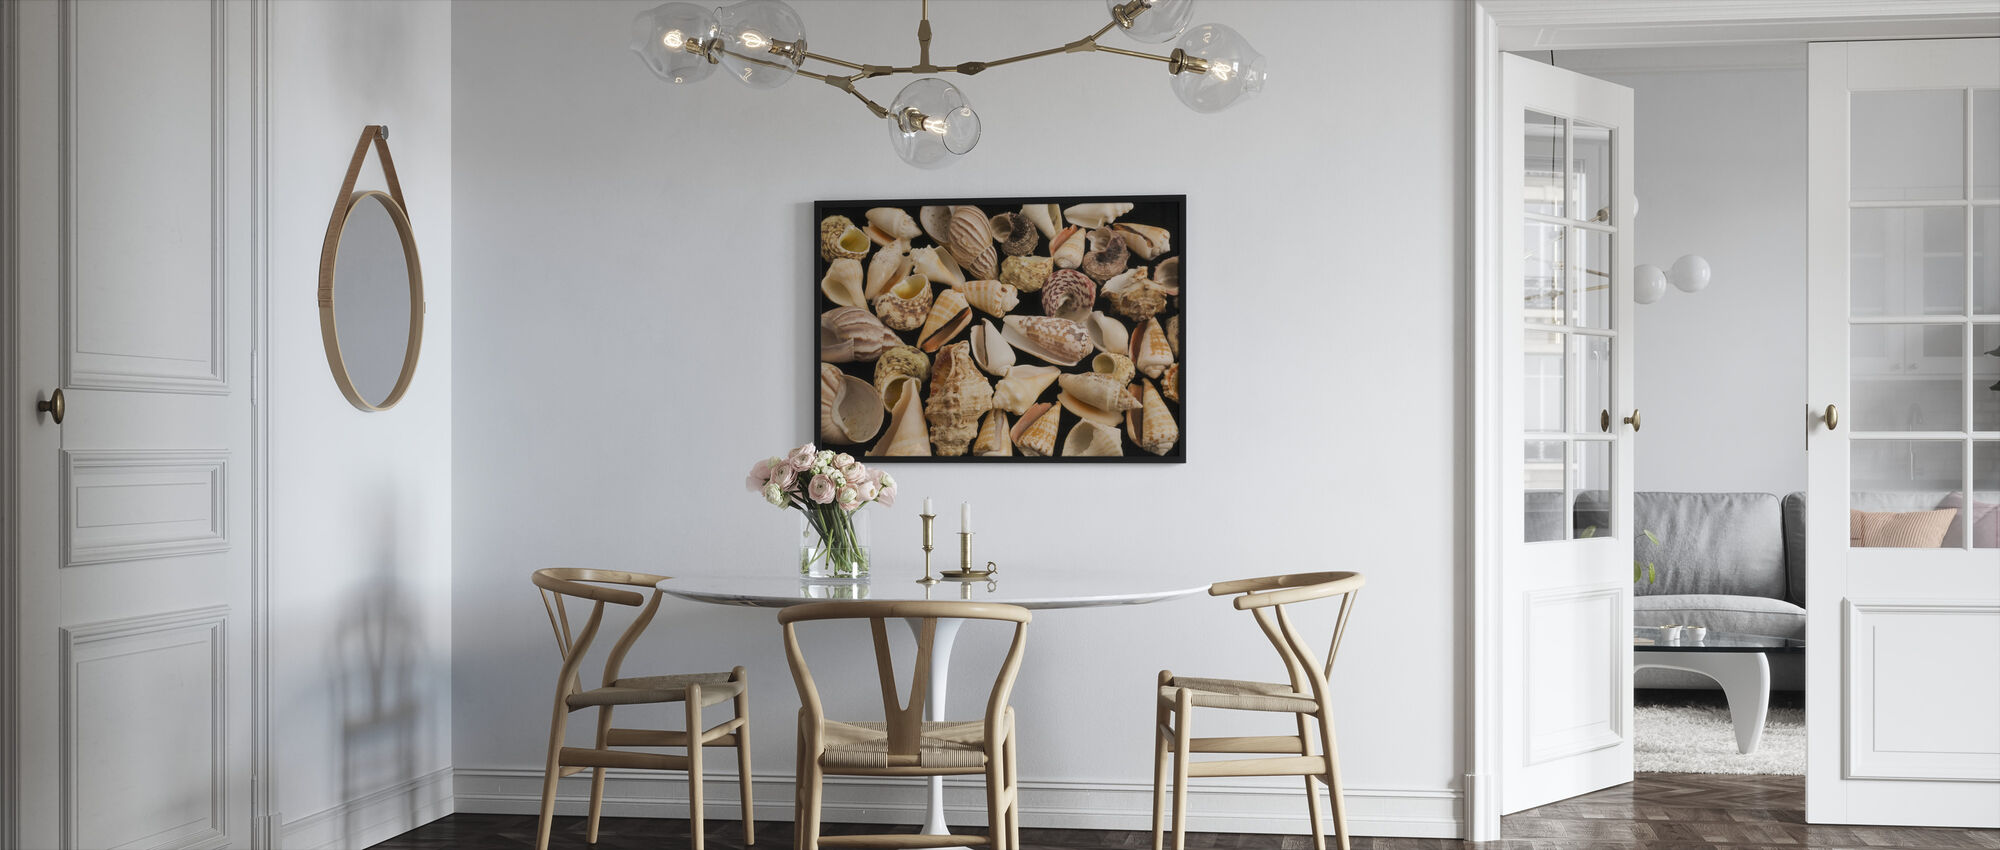 Con Shells - Framed print - Kitchen